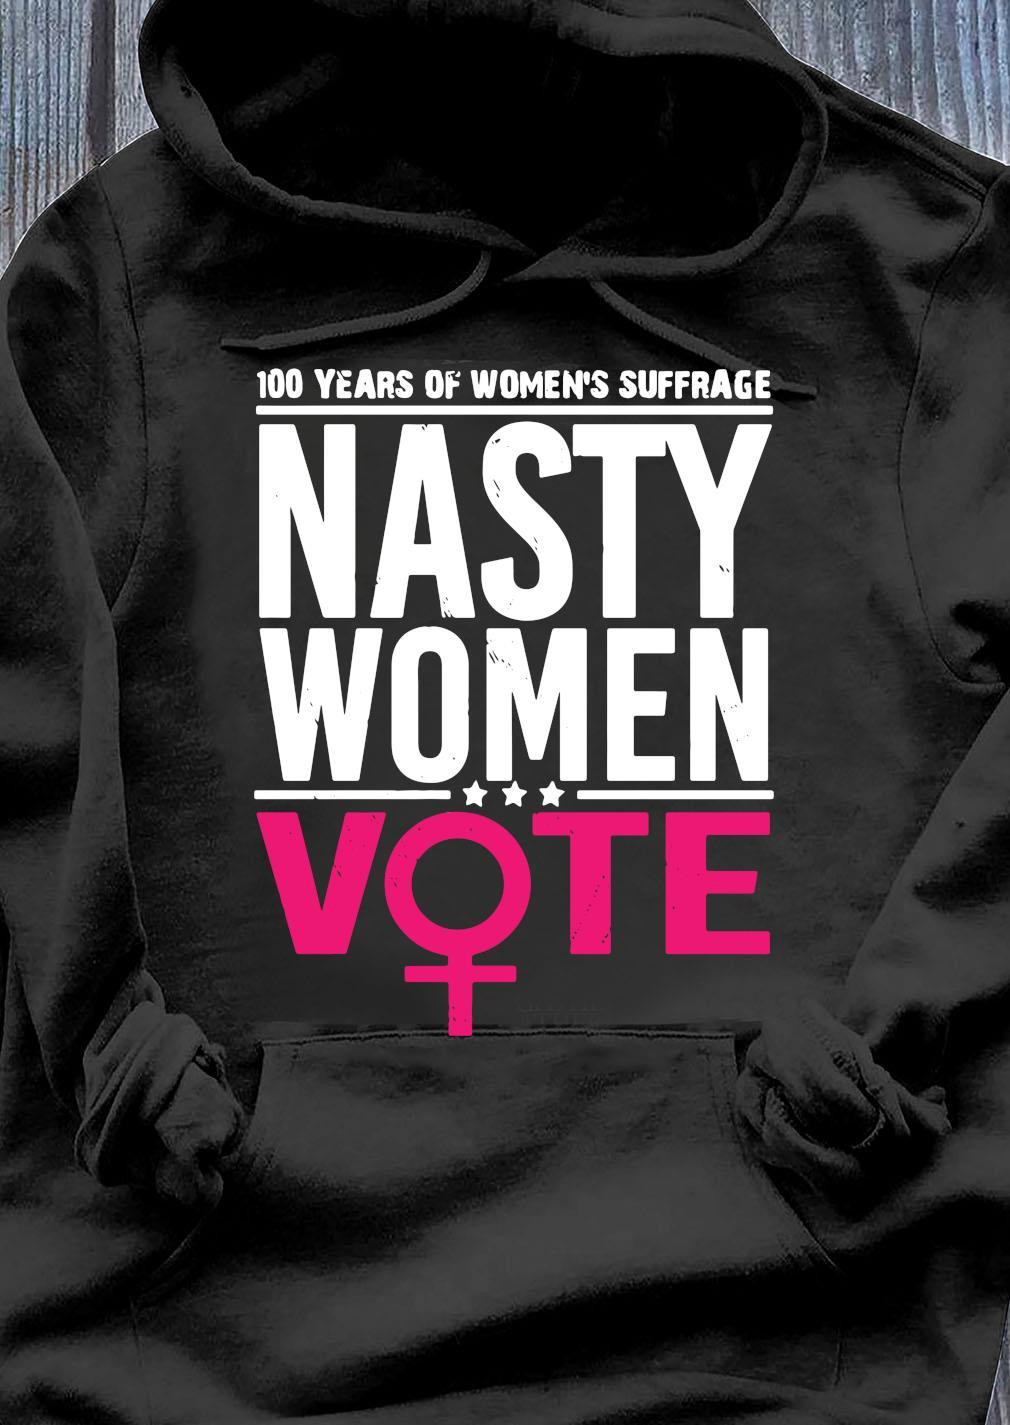 100 Years Of Women's Suffrage Nasty Women Vote Shirt Hoodie